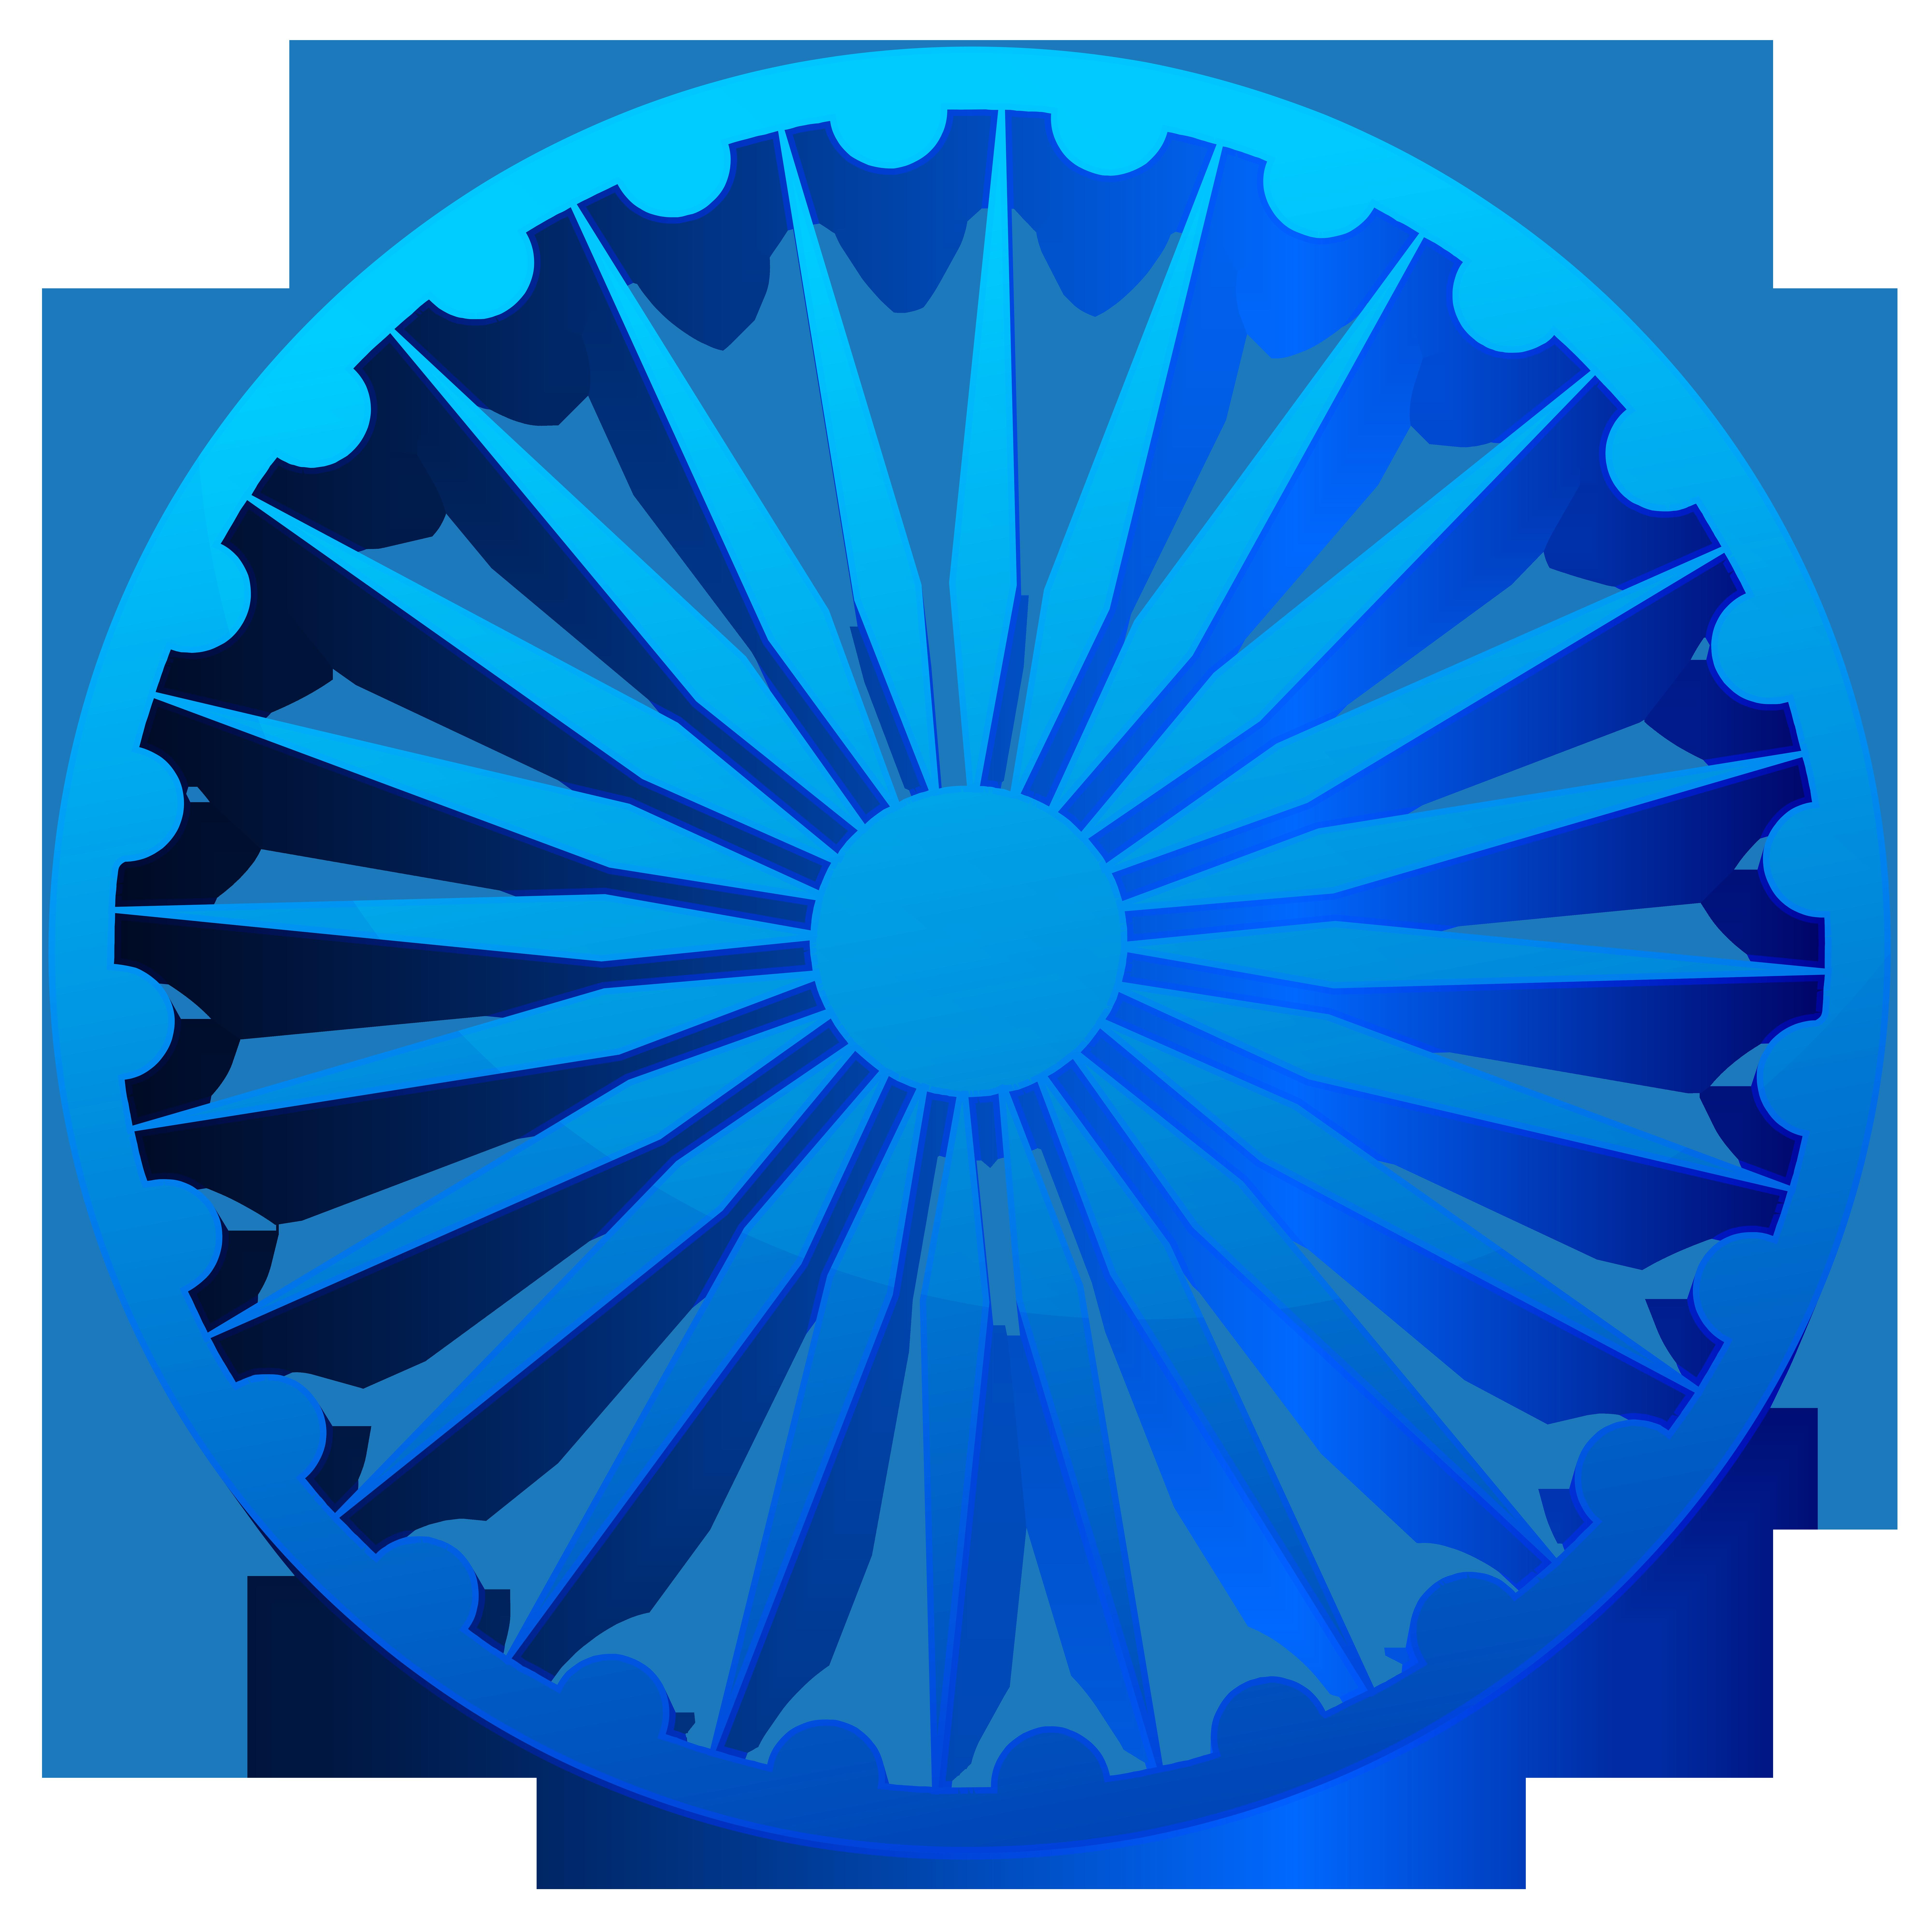 Ashoka Chakra India Transparent PNG Clip Art Image.